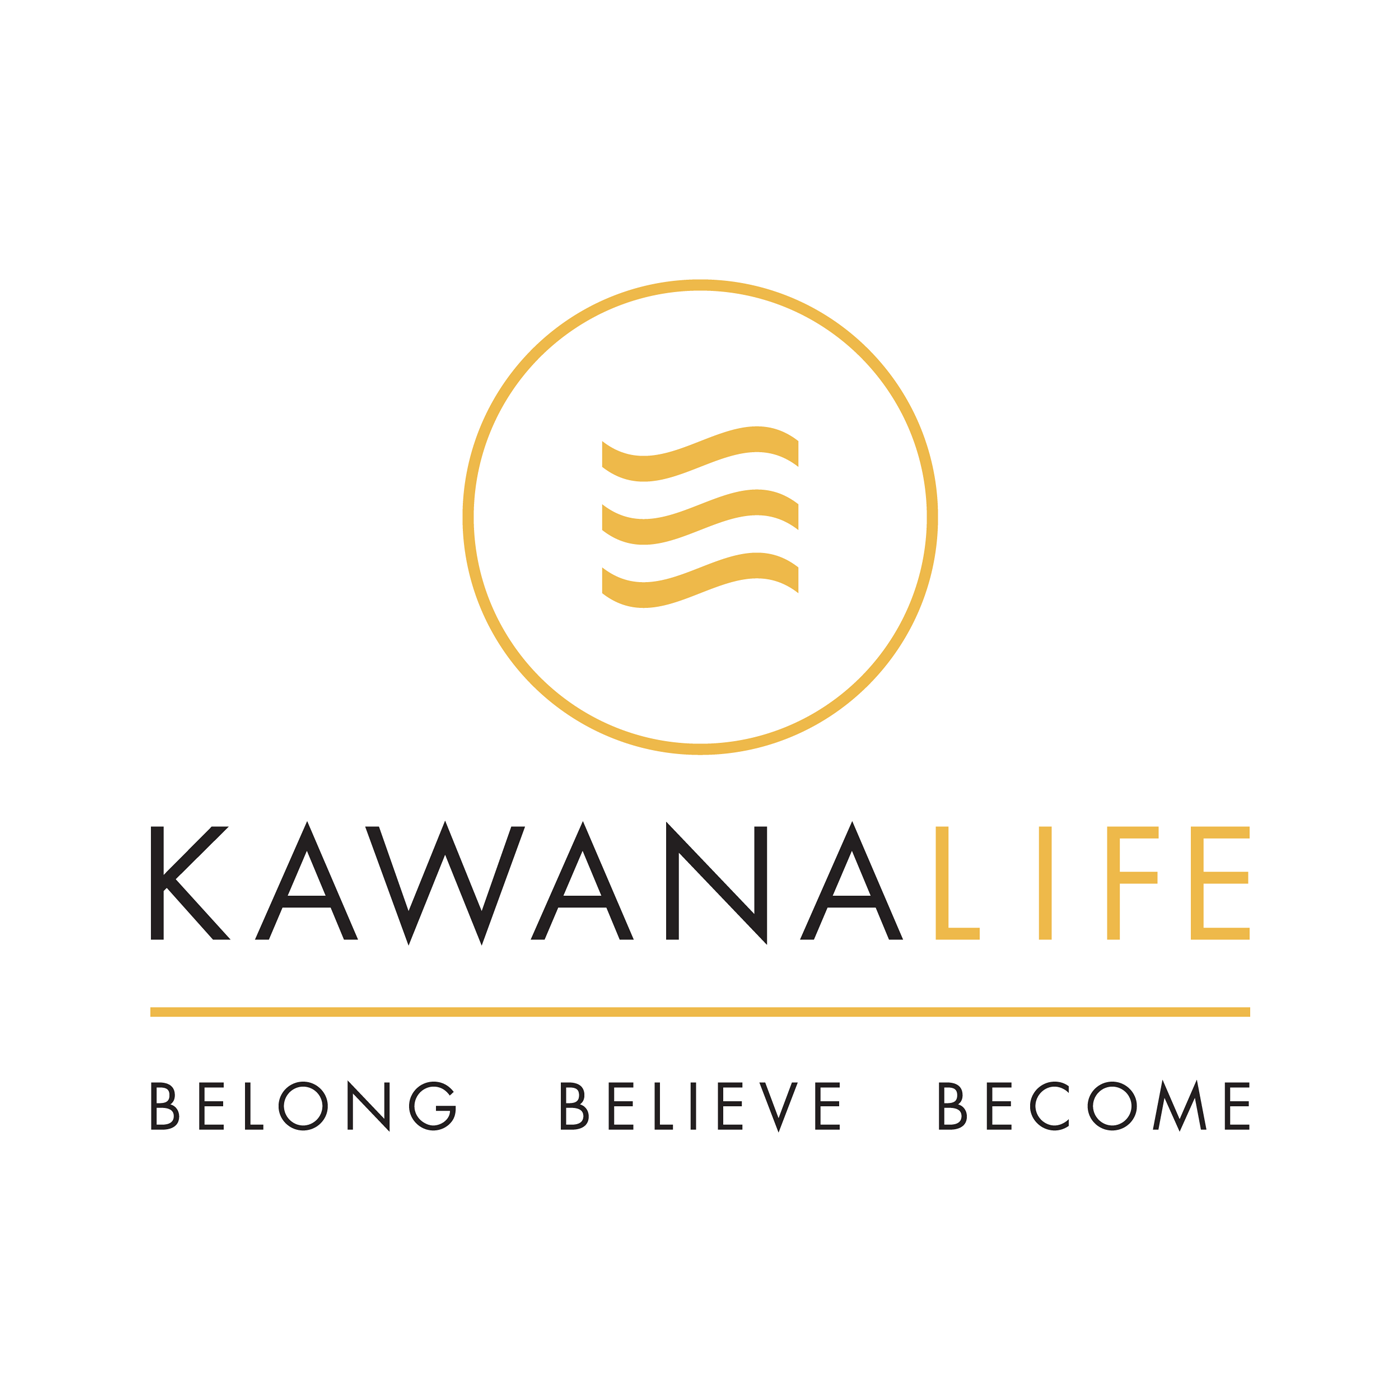 KawanaLife Messages